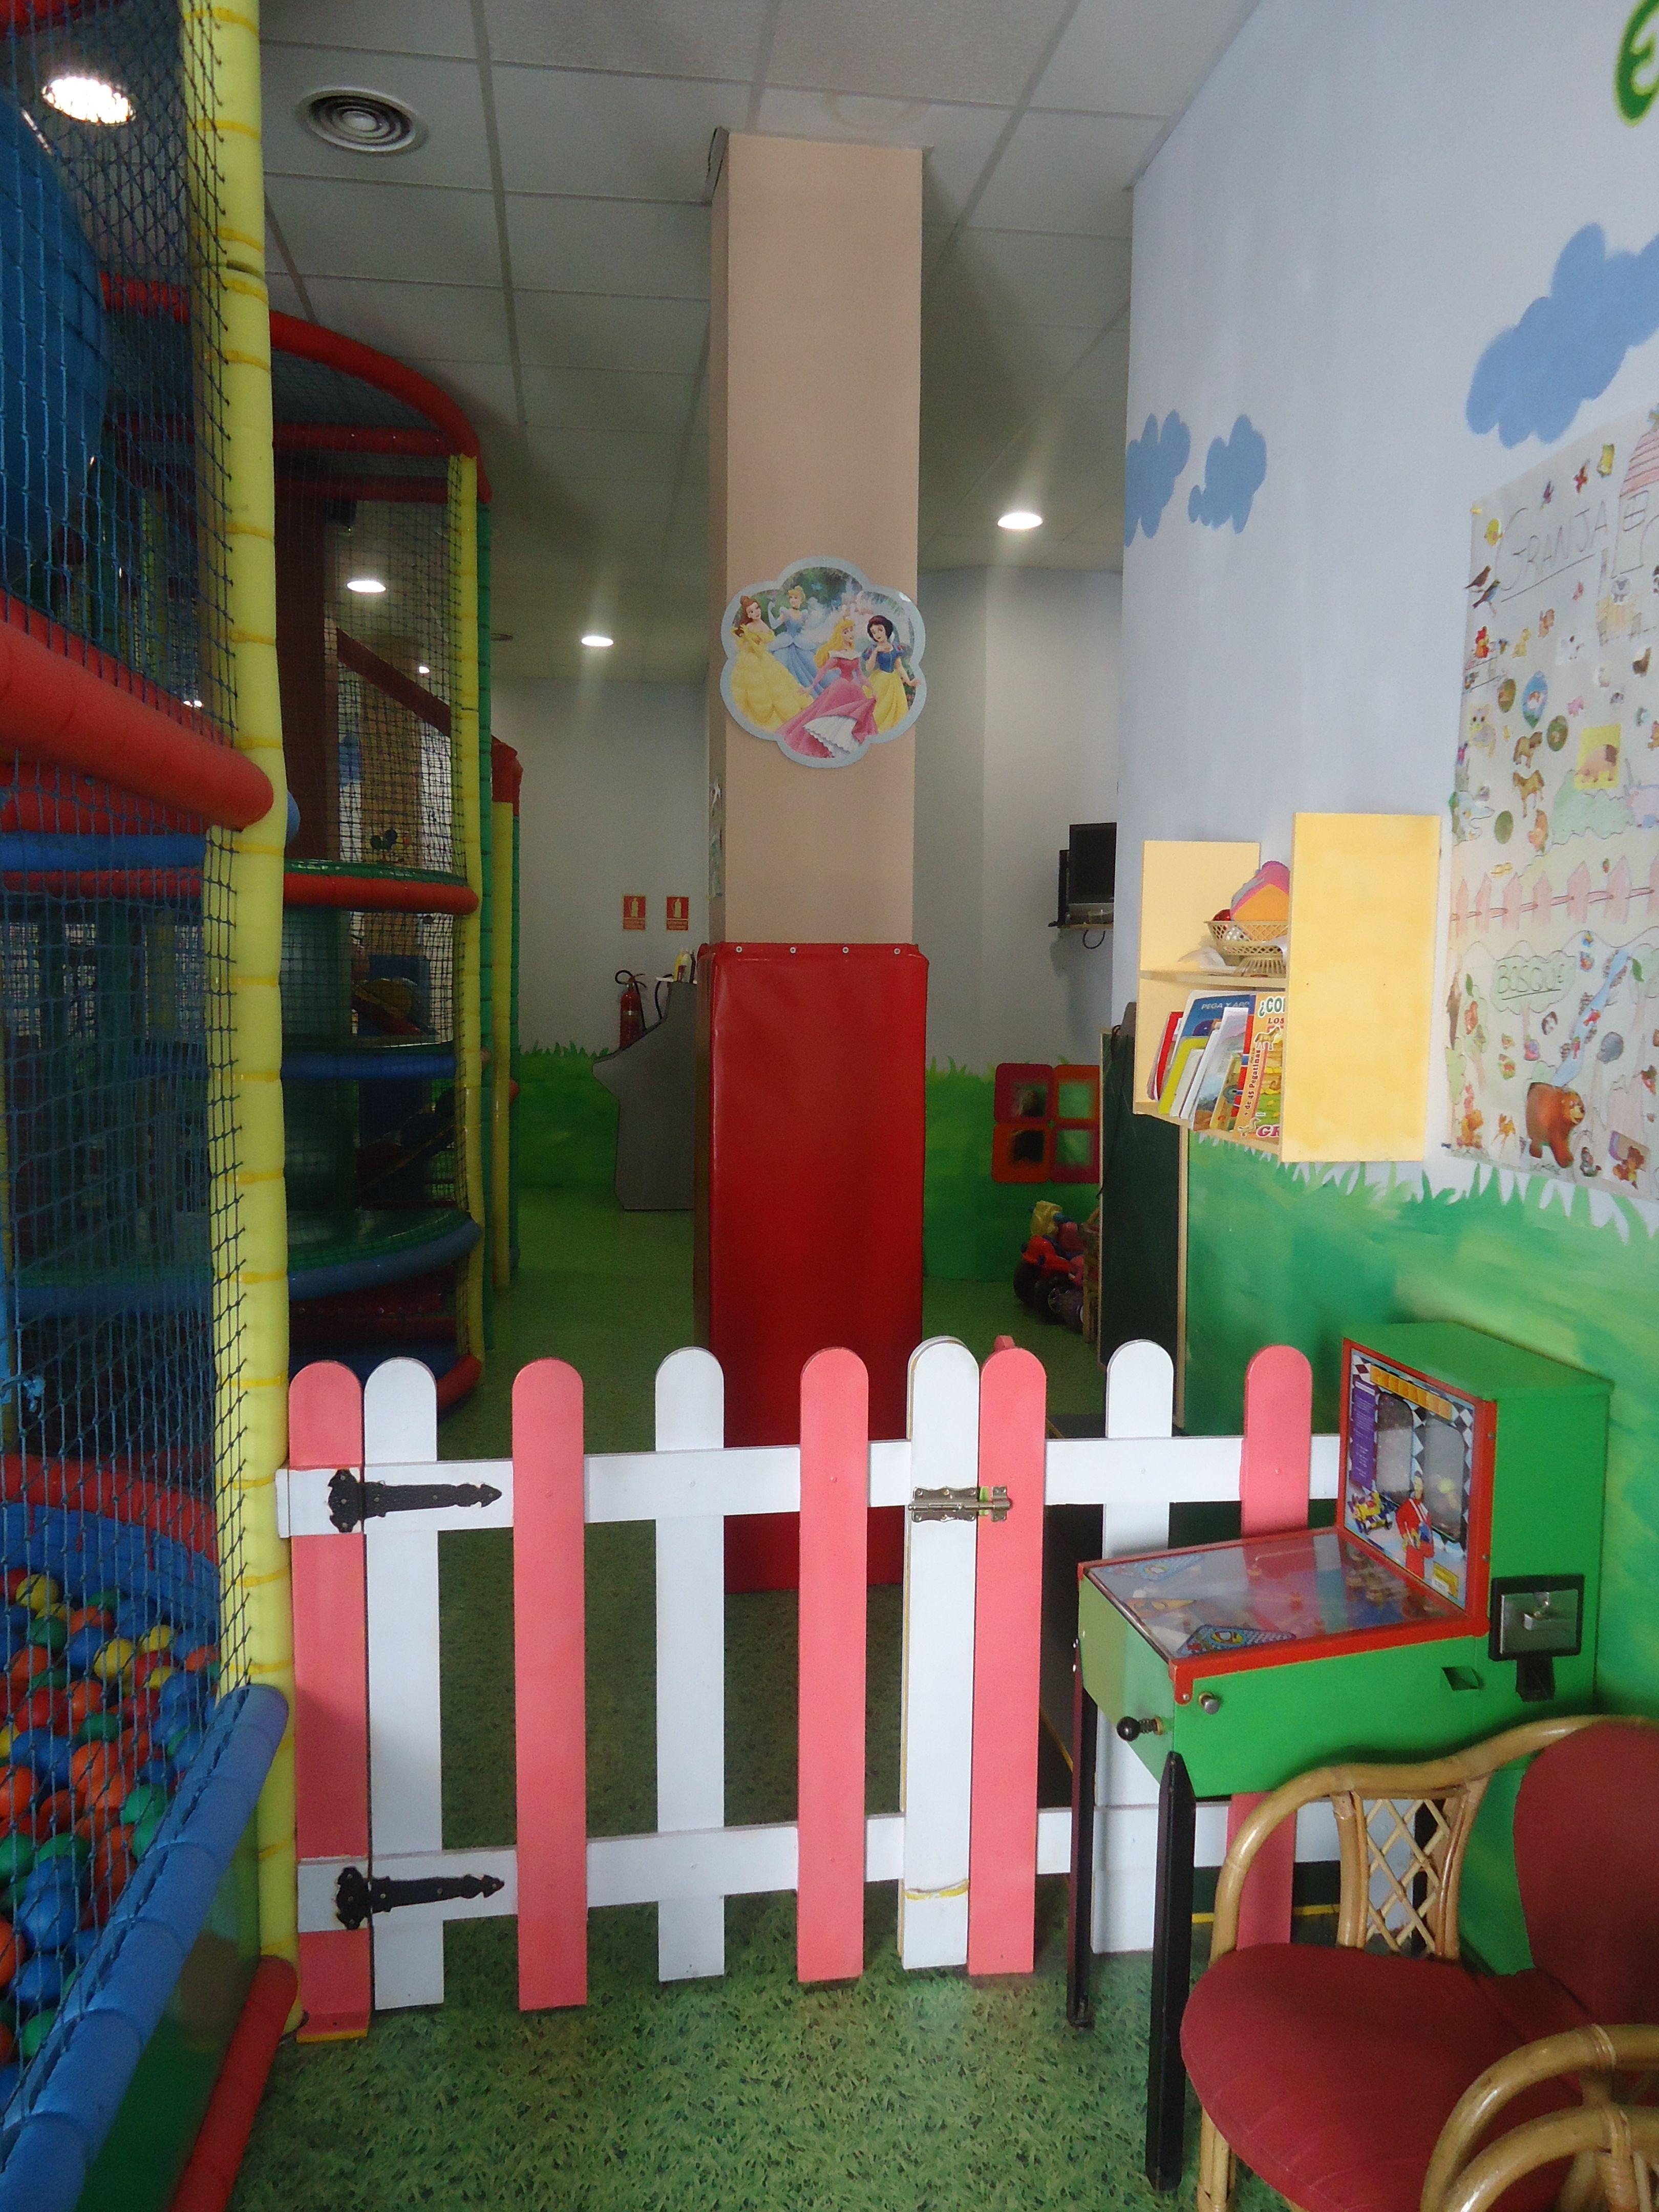 Foto 20 de Parques infantiles en Móstoles | Gnomos y Hobbits